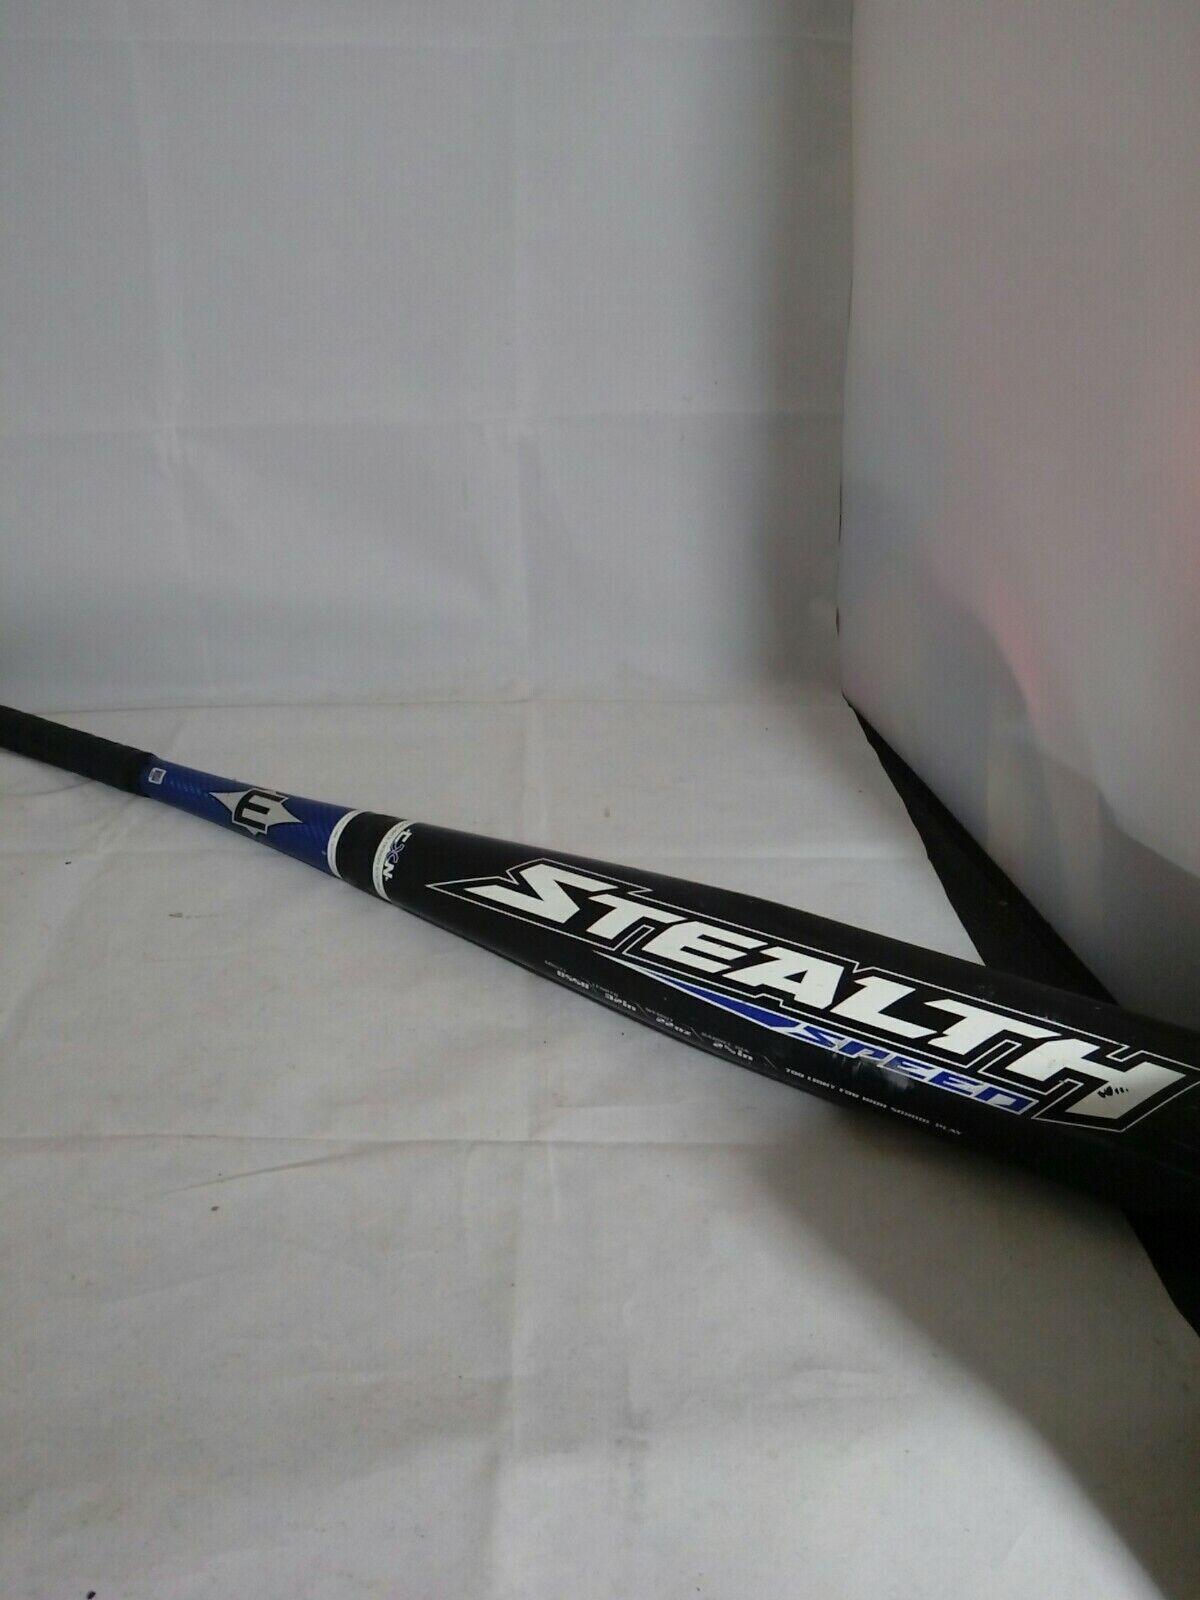 Easton  Stealth Speed 75 Flex -10 32 22 Composite Youth Baseball Bat.